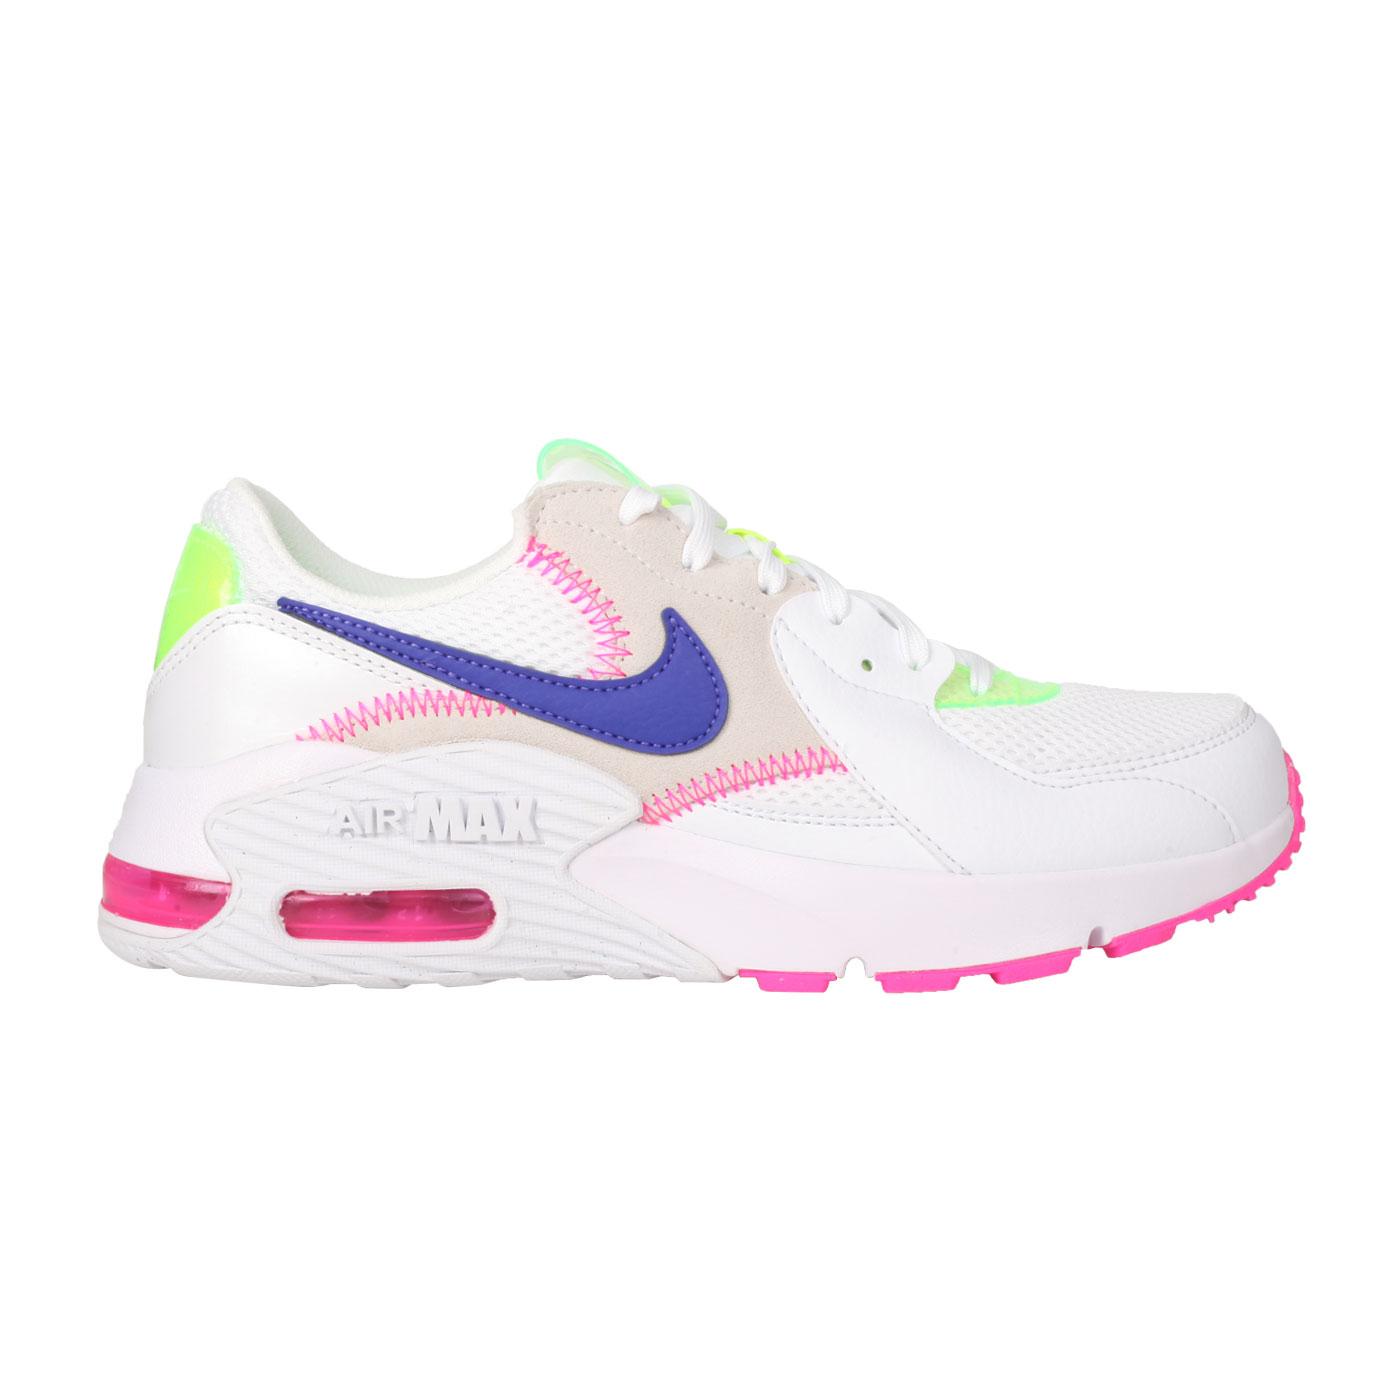 NIKE 女款運動休閒鞋  @WMNS AIR MAX EXCEE AMD@DD2955100 - 白粉藍綠